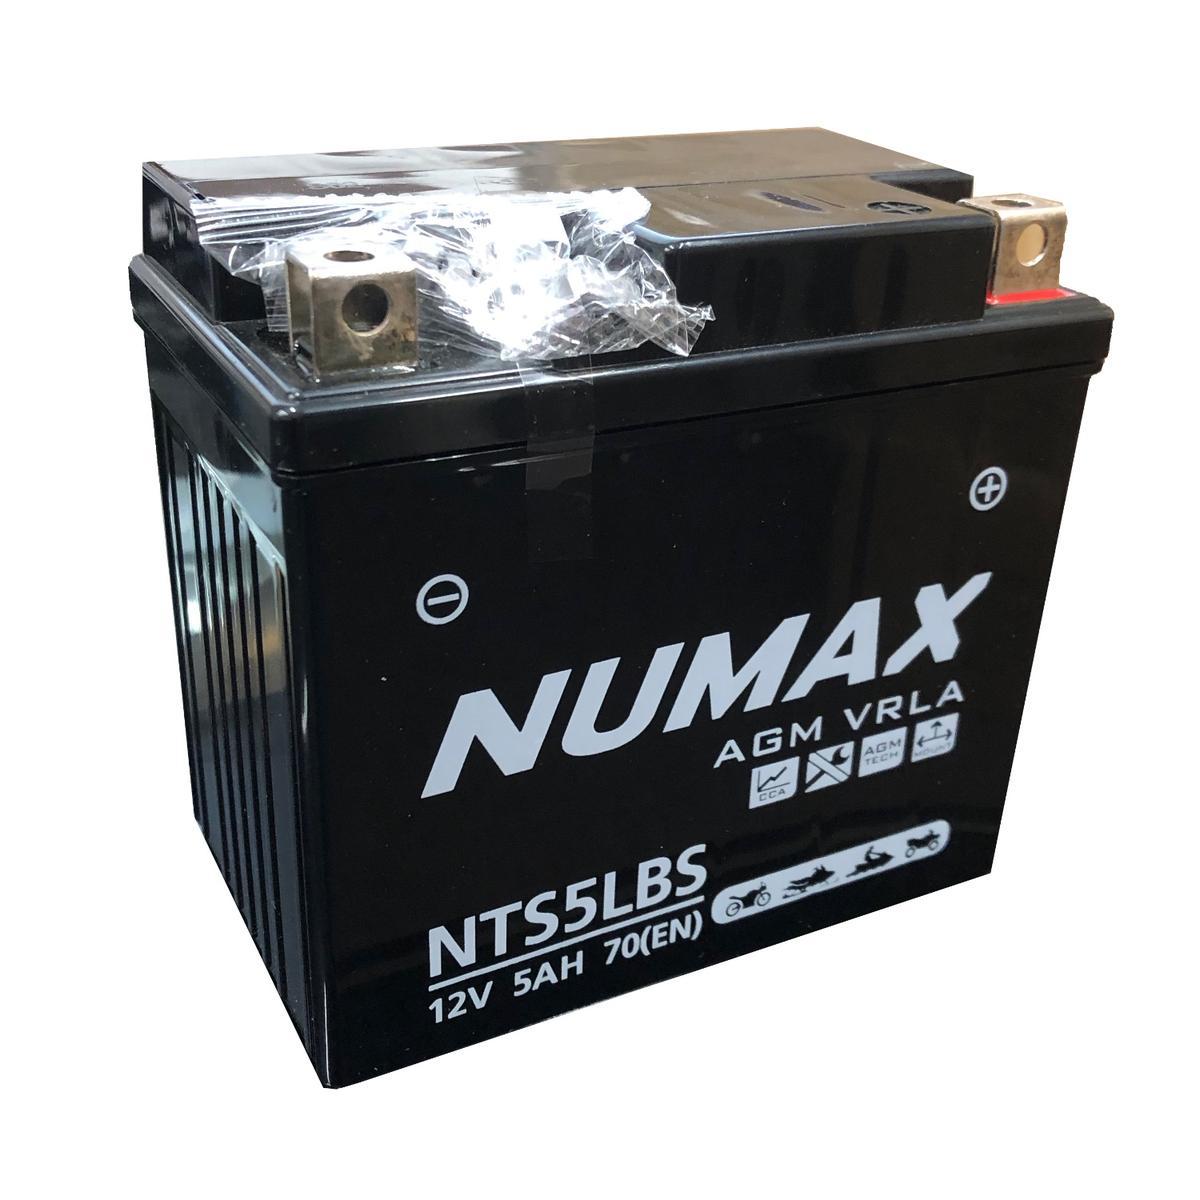 Numax 12v NTS5LBS Motorbike Bike Battery YAMAHA 100cc YT 100 YTX5L-4